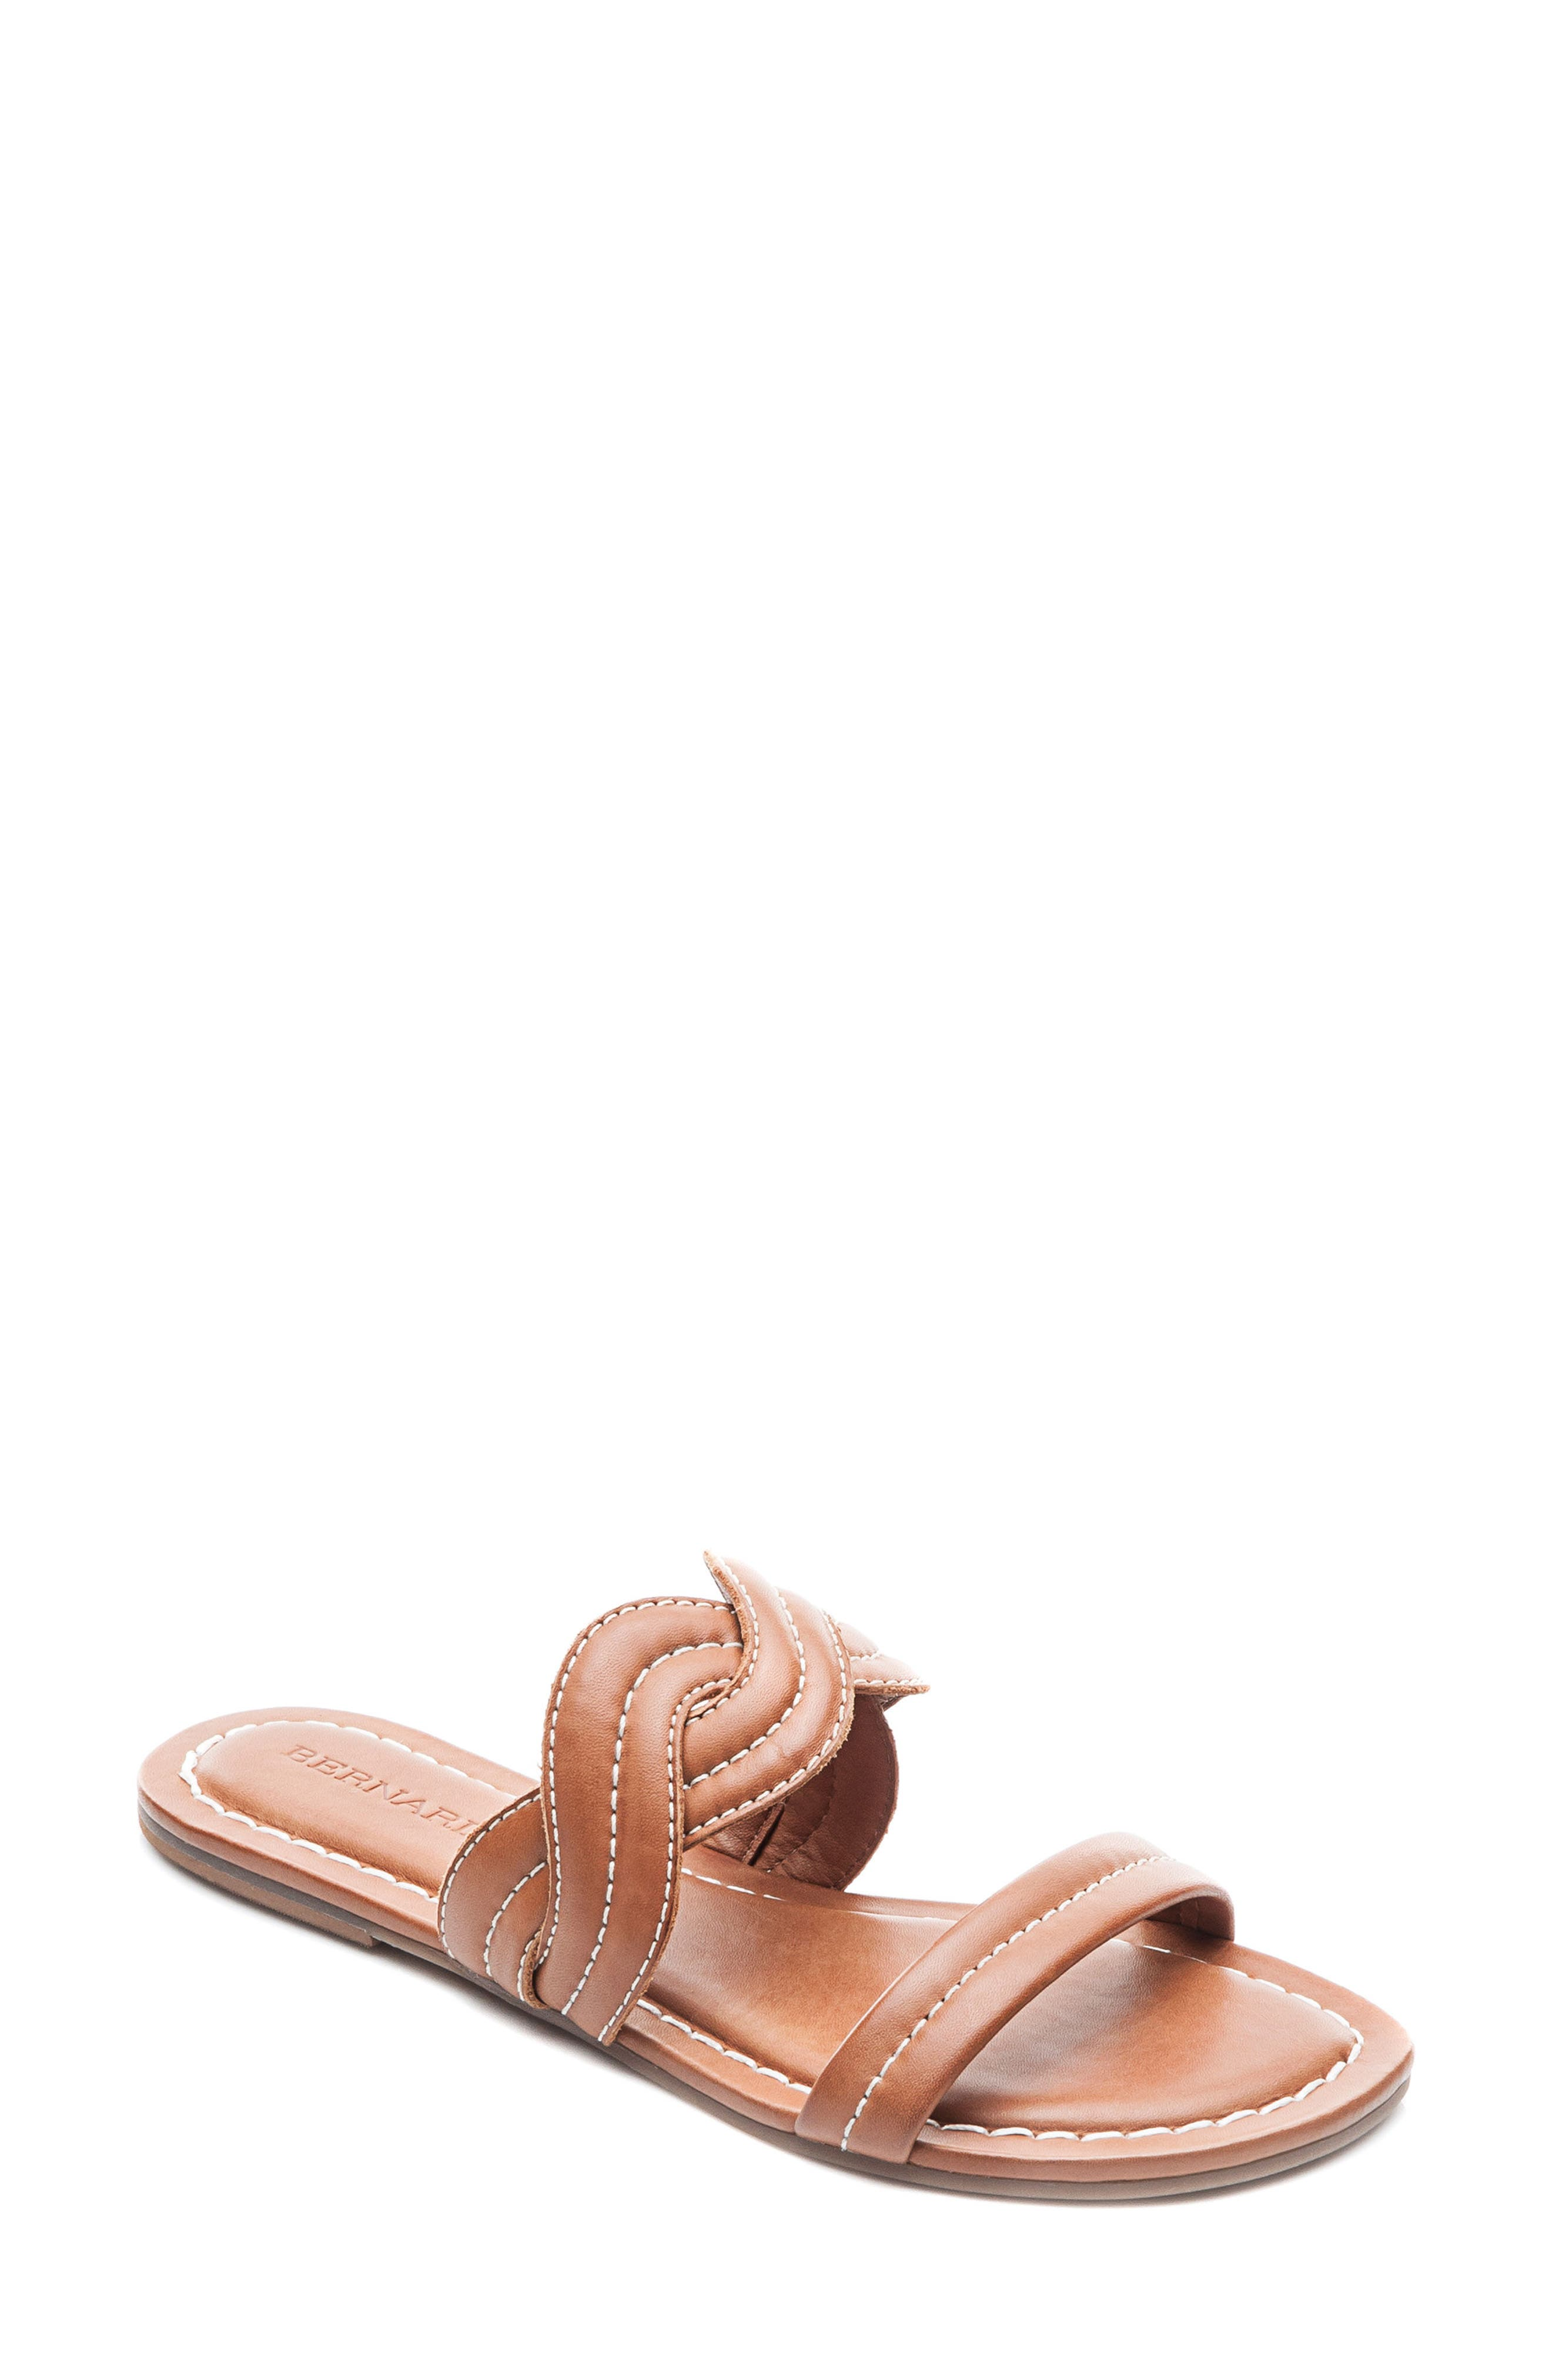 Bernardo Women's Leather Double Strap Slide Sandals yuep4